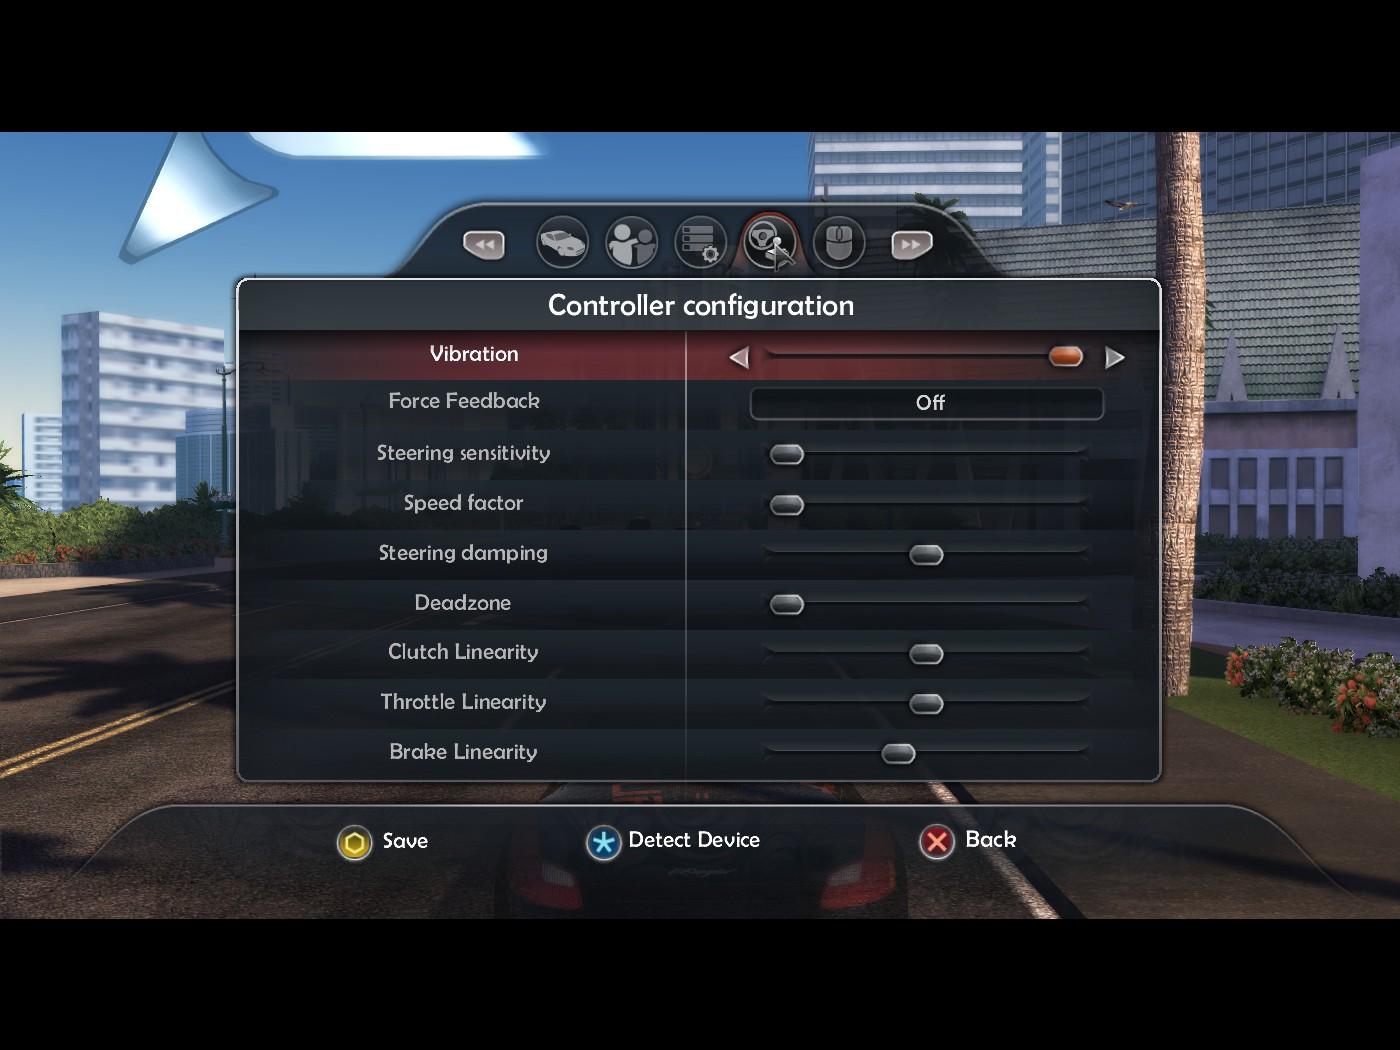 Драйвер для руля defender для пк